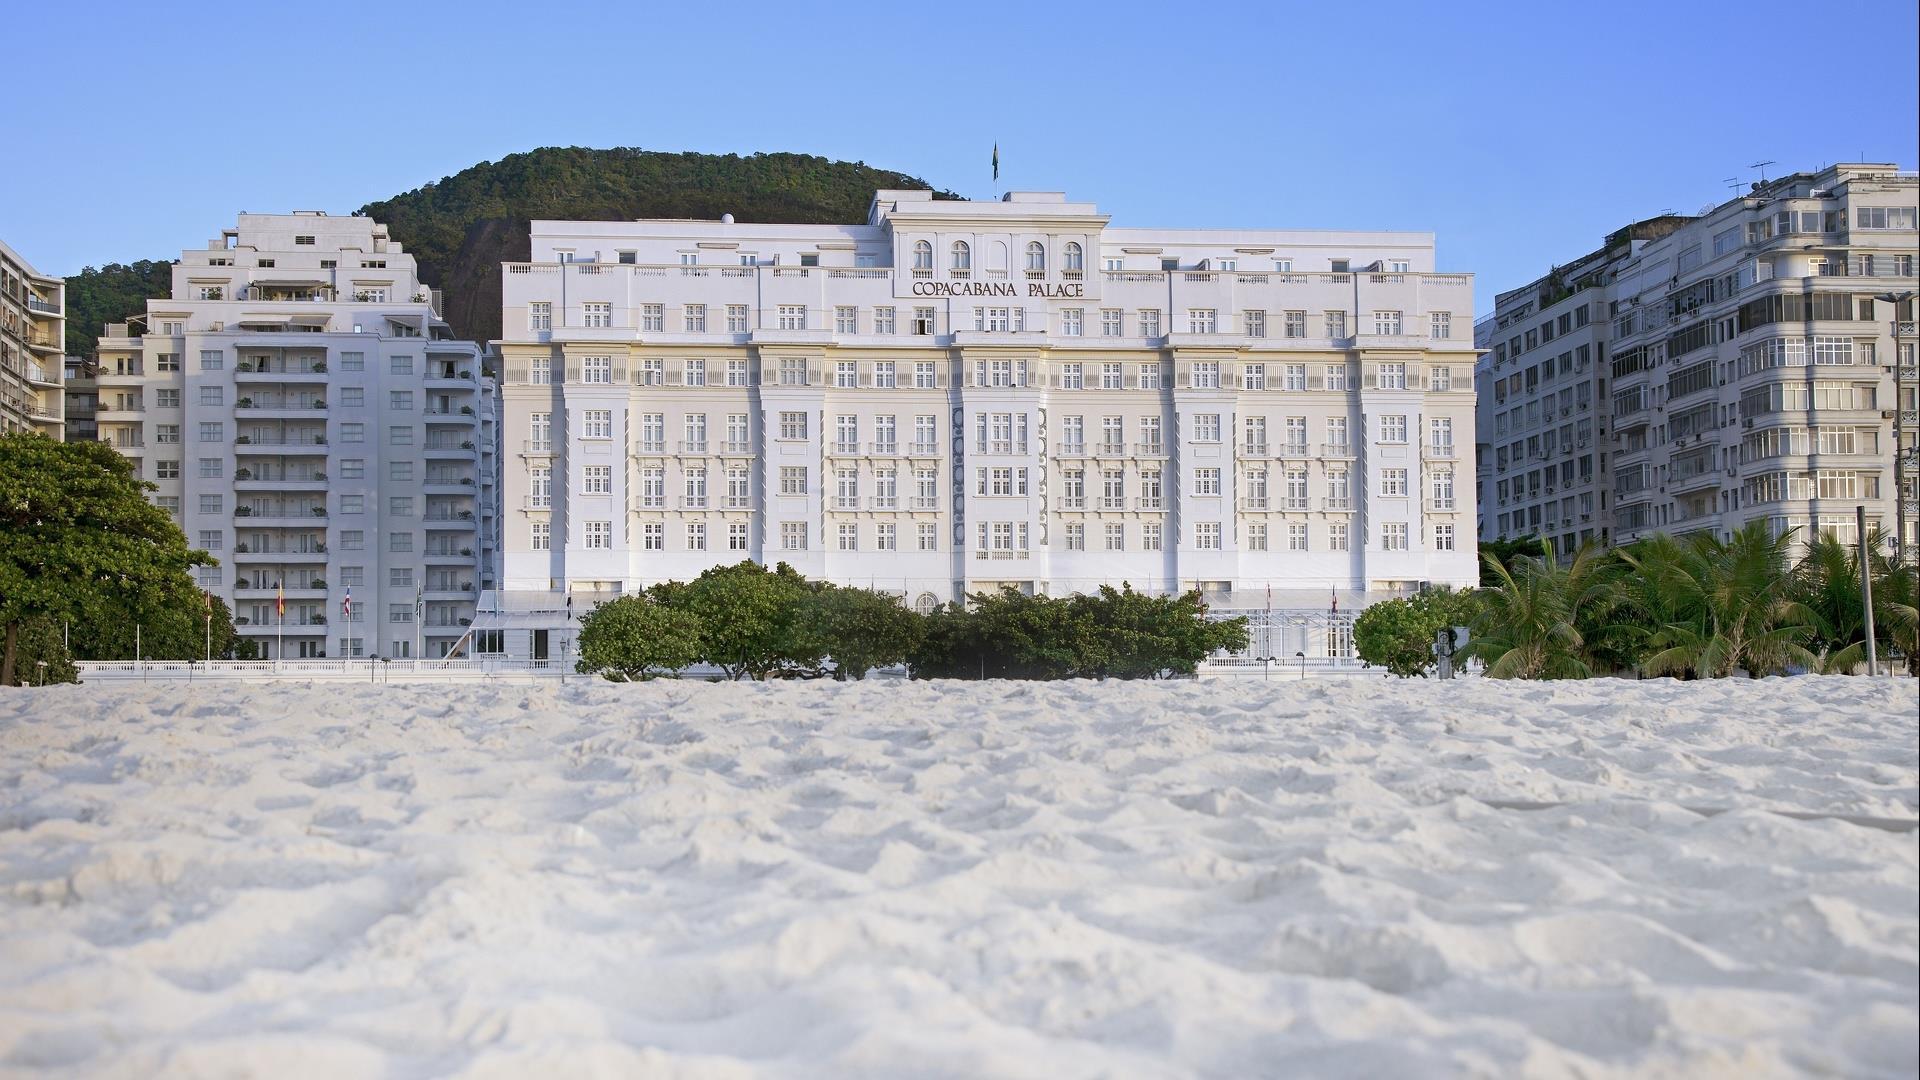 Brasilien Rio de Janeiro: Deluxe Hotel - Hotel Belmond Copacabana Palace